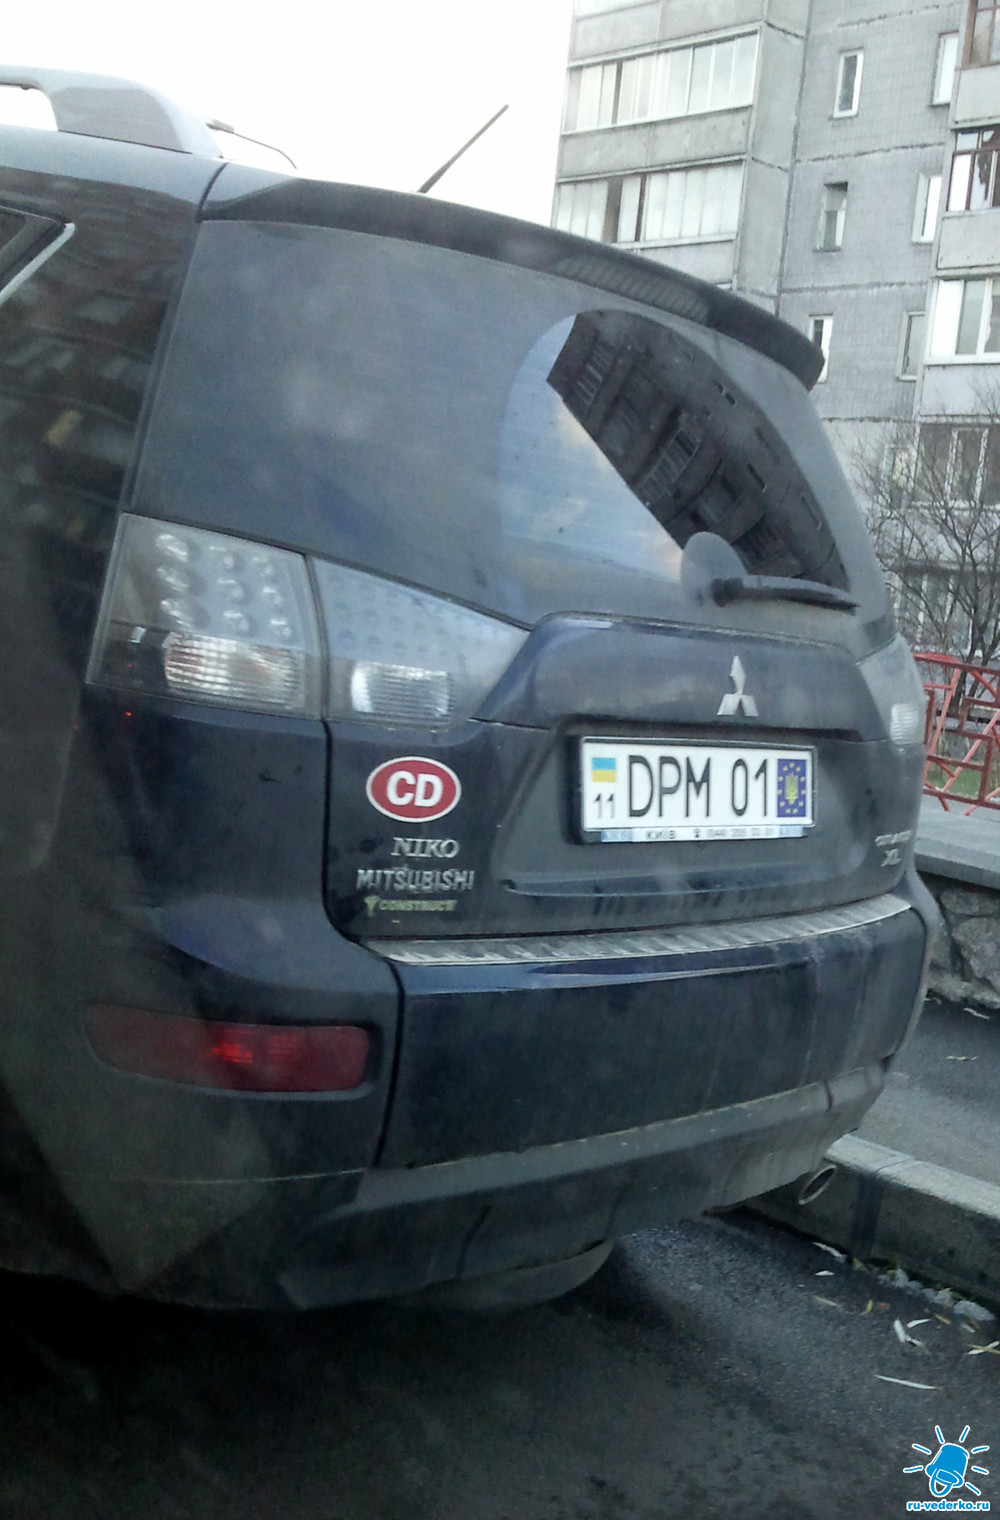 (11) DPM 01